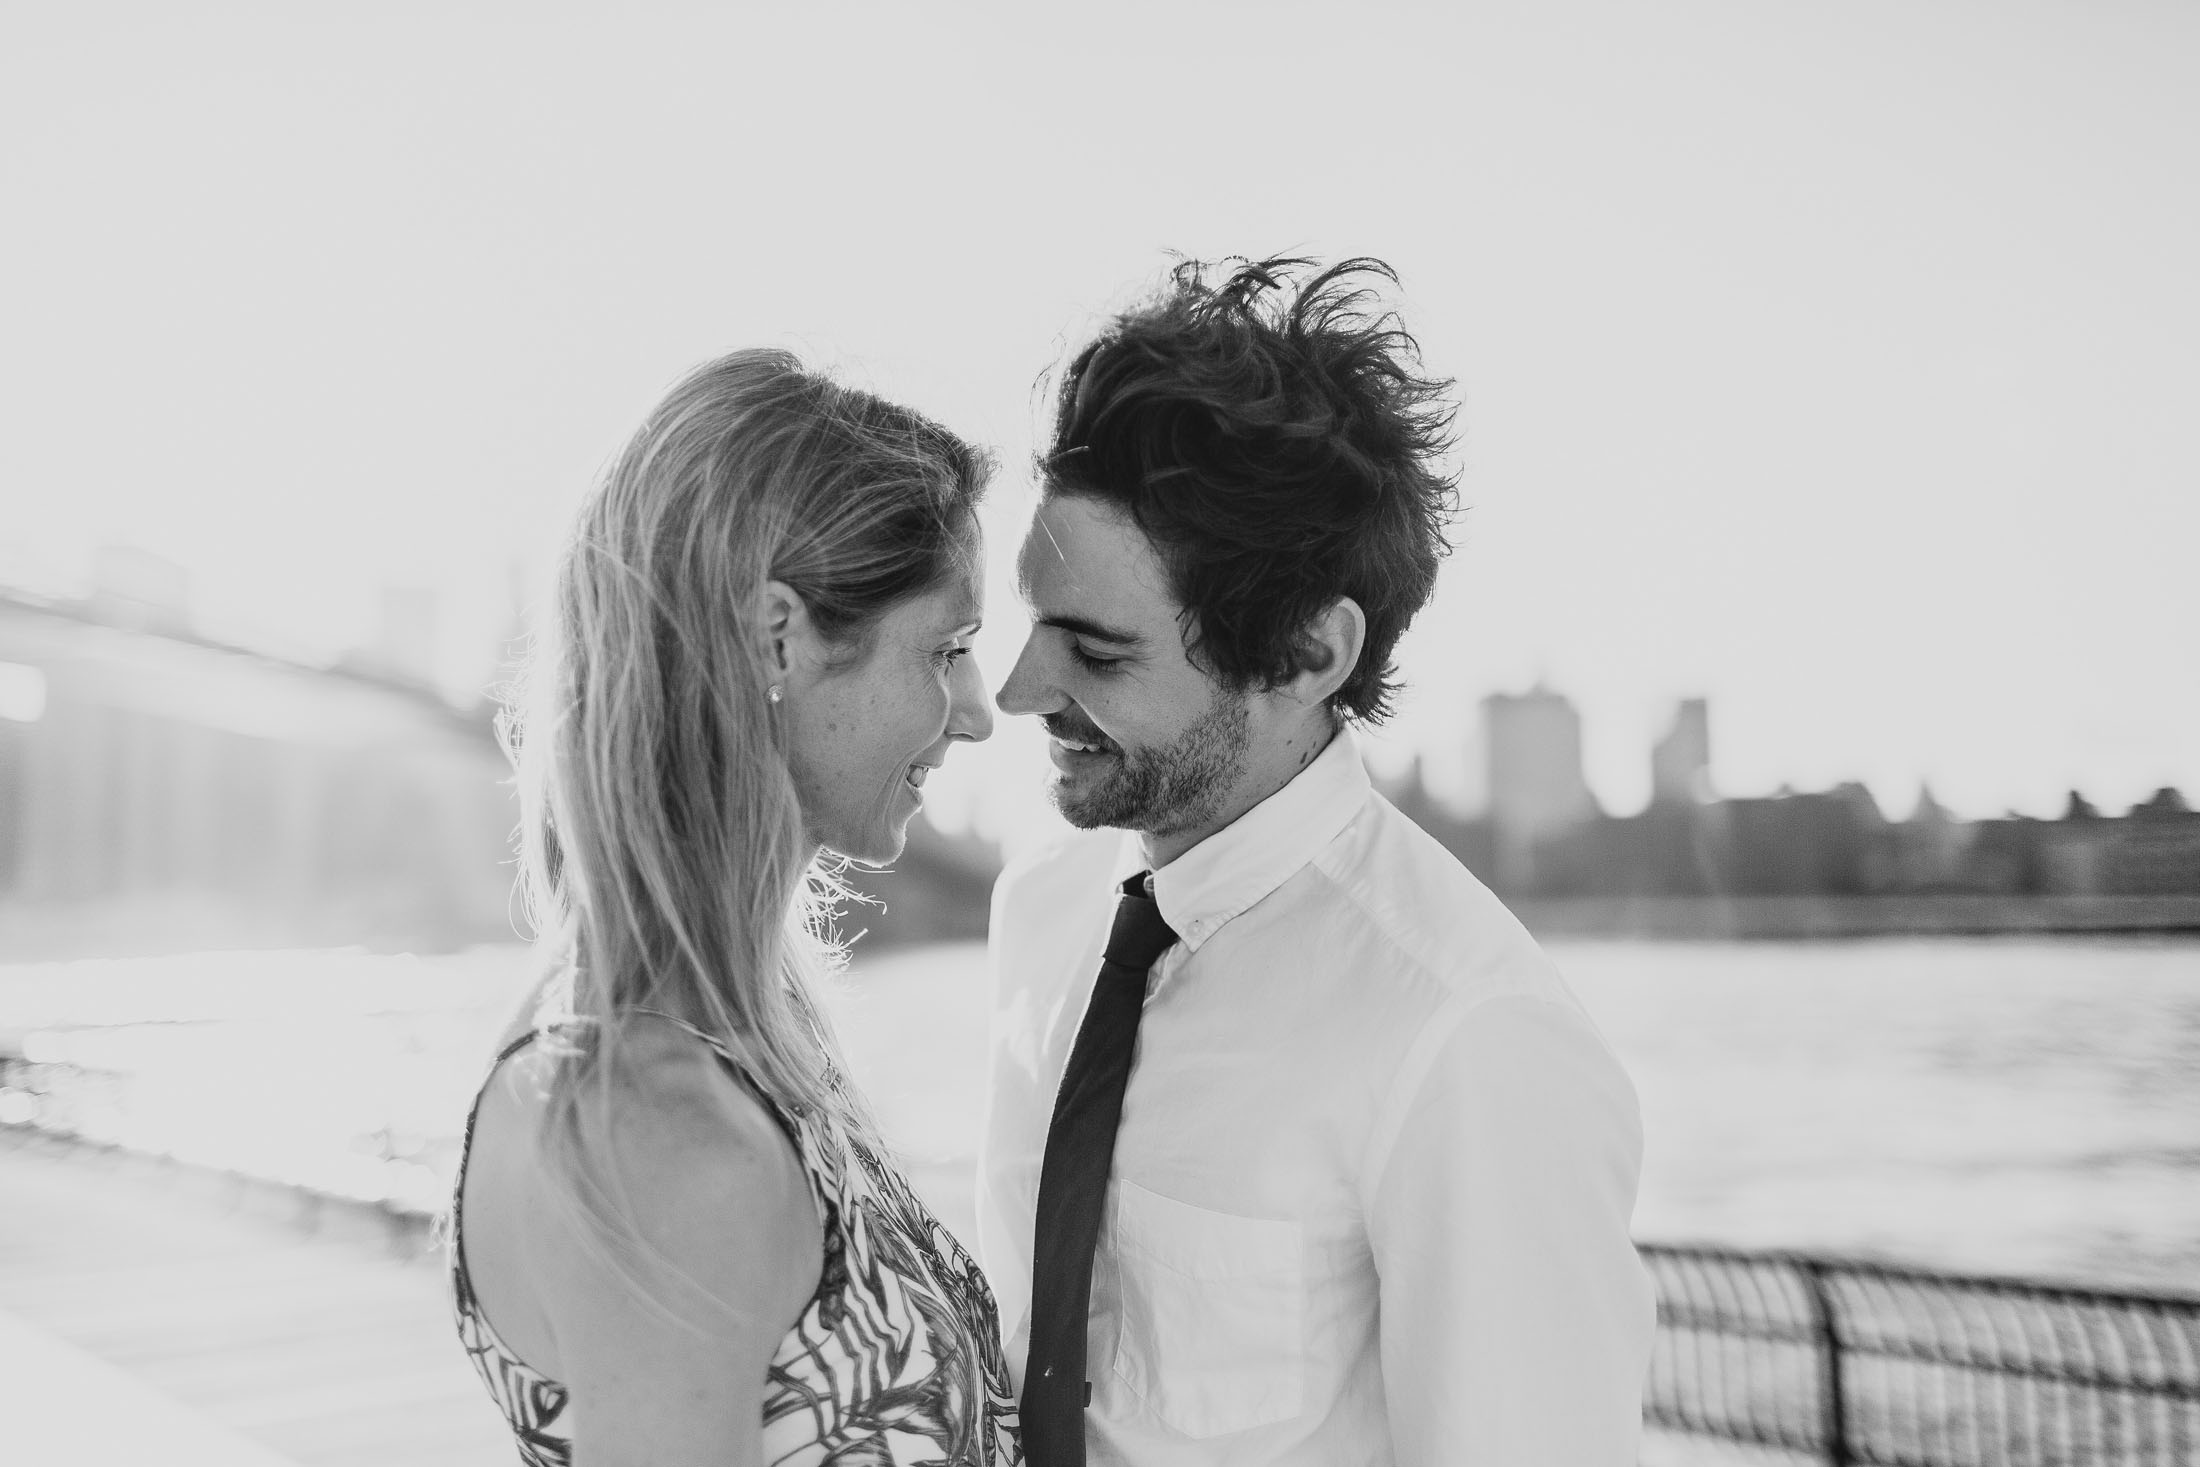 35 finch and oak engagement wedding photographer gold coast new york brooklyn.jpg